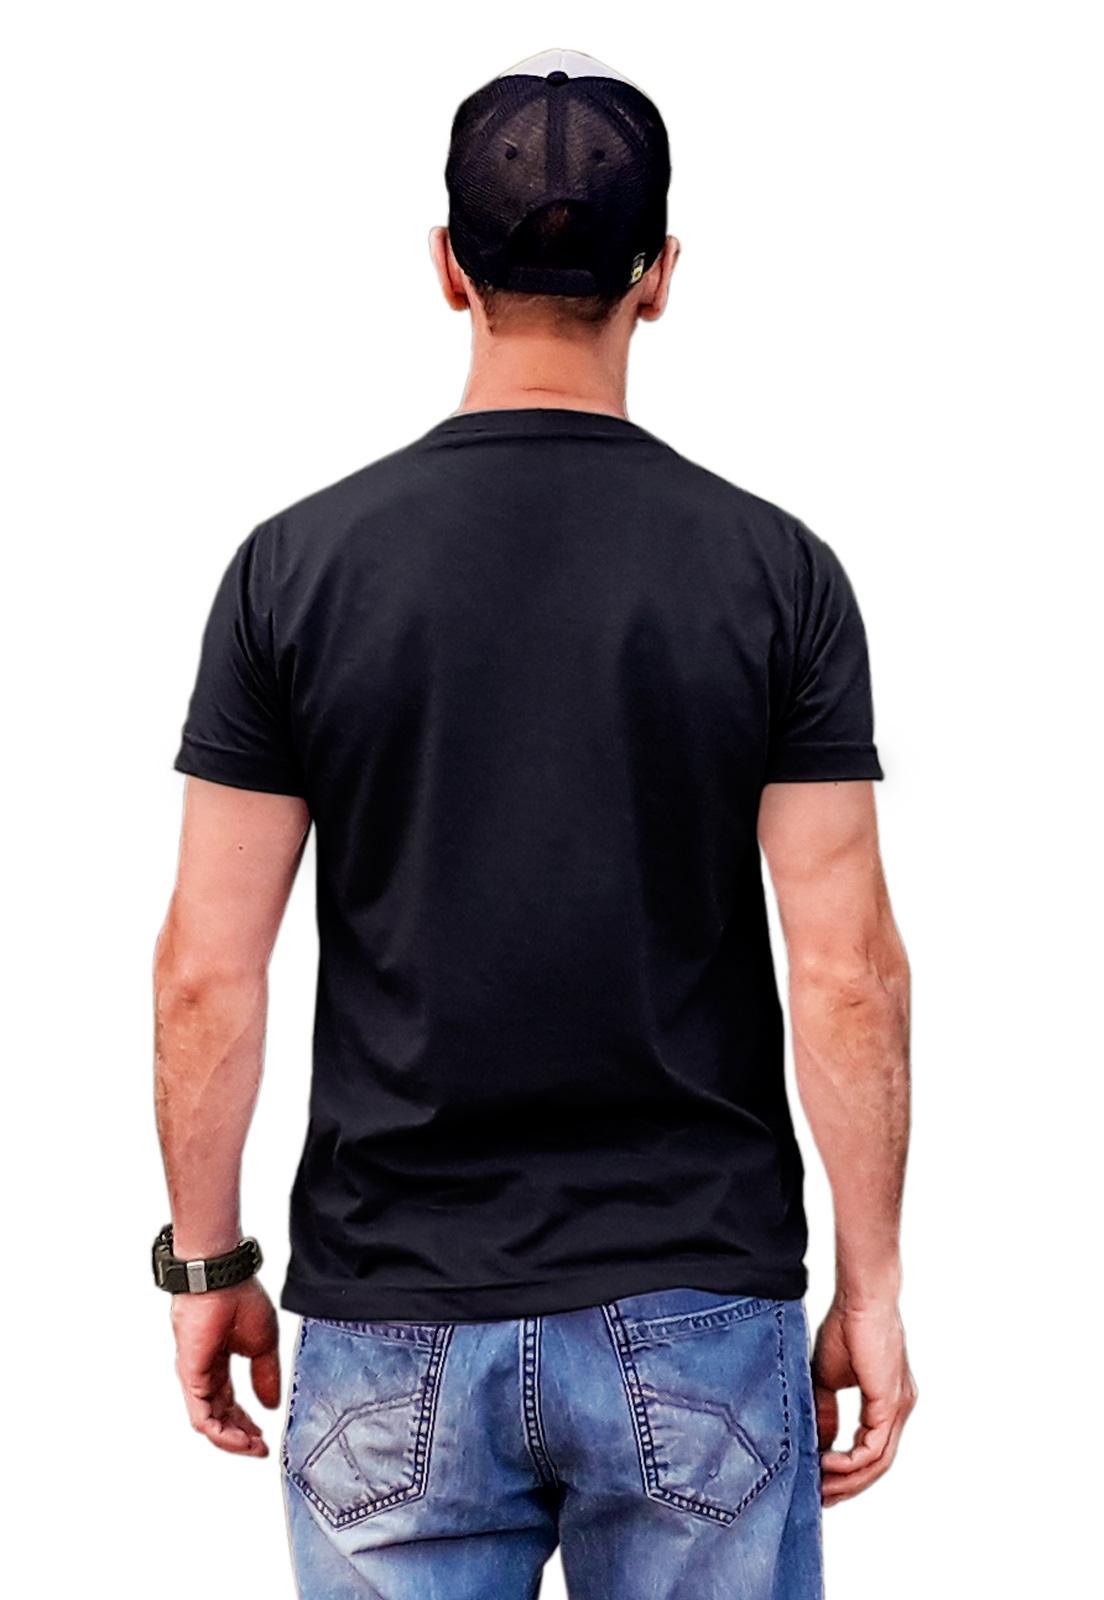 Camiseta sustentável estampada full rotation preta ou branca